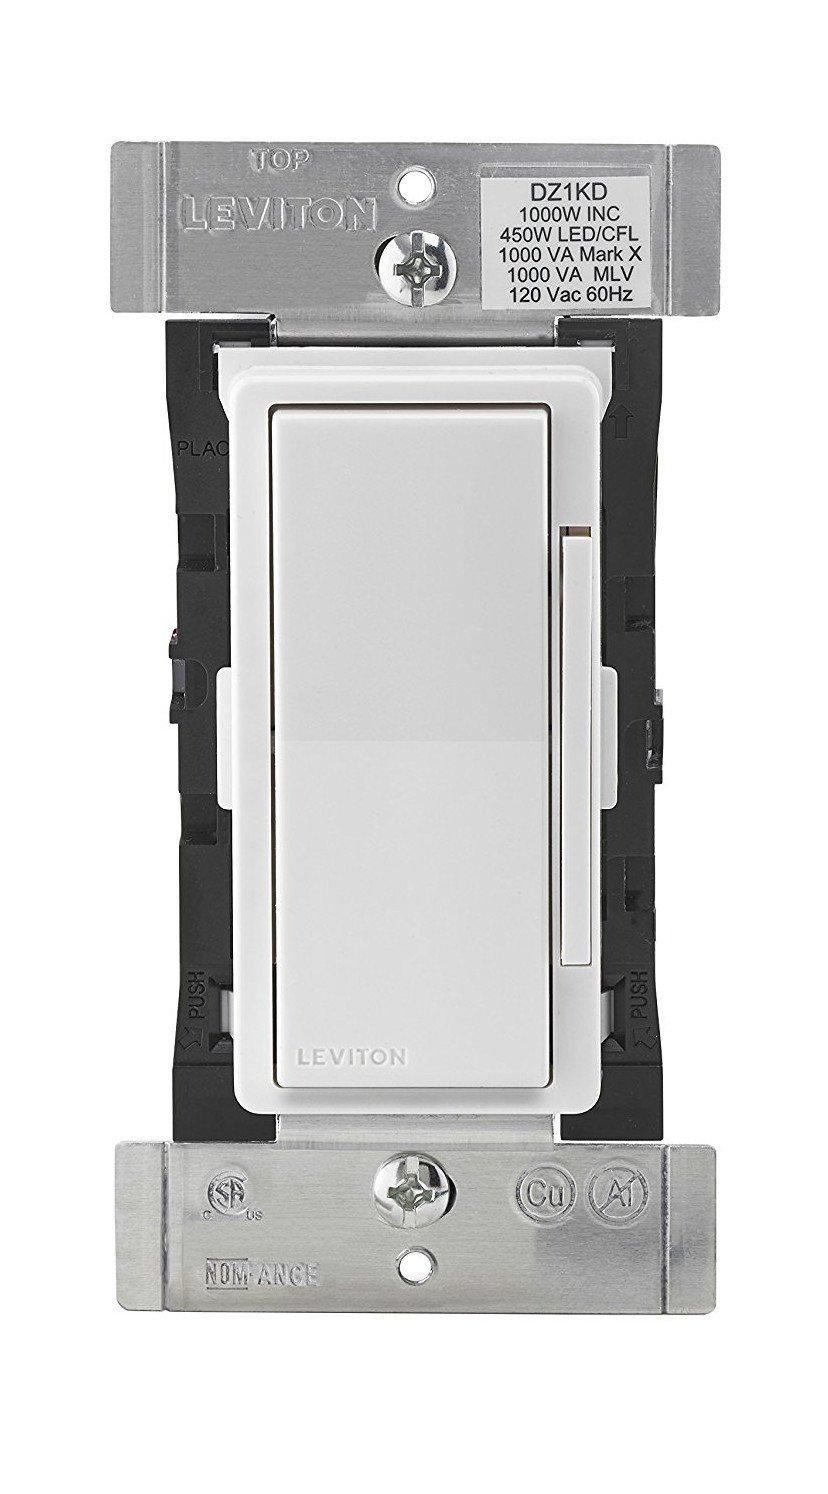 Leviton DZ1KD-1BZ Decora Smart 1000W Dimmer with Z-Wave Plus Technology, Works with Amazon Alexa (6 Pack) by Leviton (Image #2)